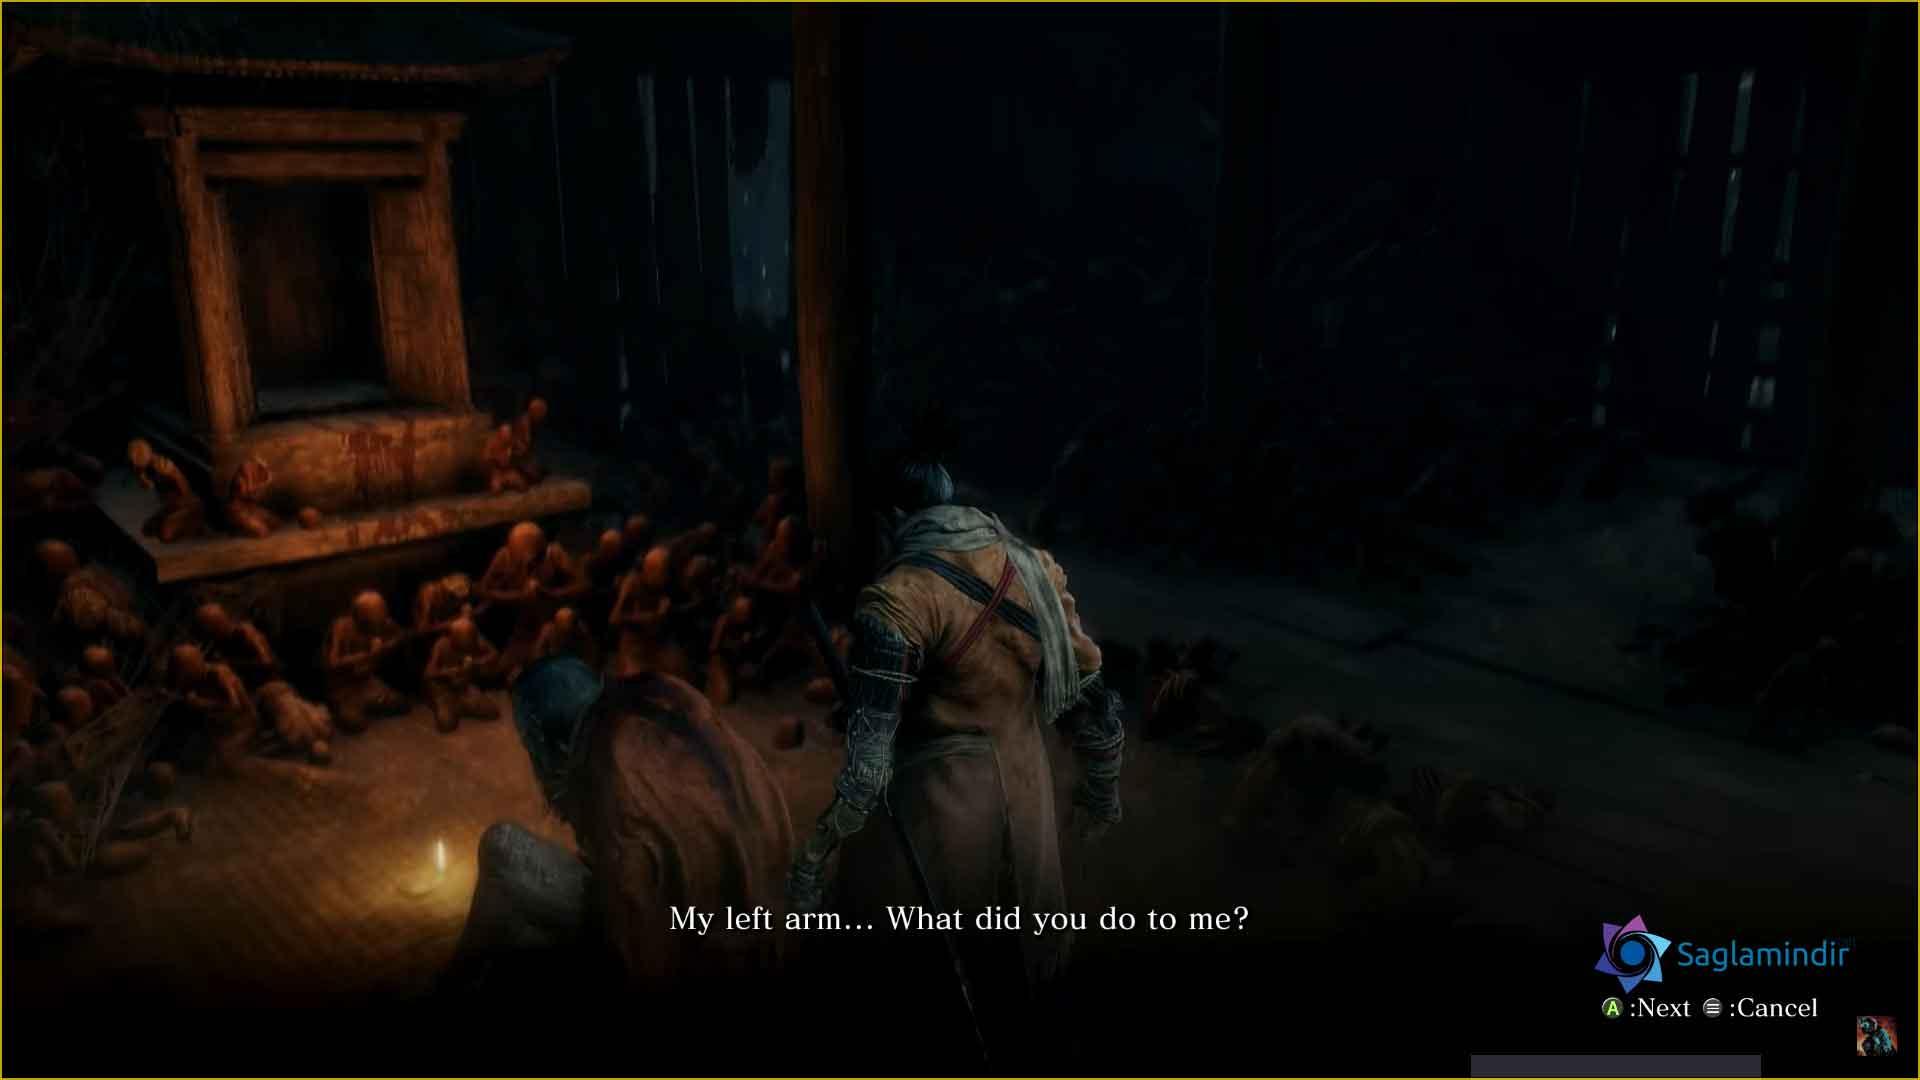 sekiro shadows die twice oyunu ücretsiz indir